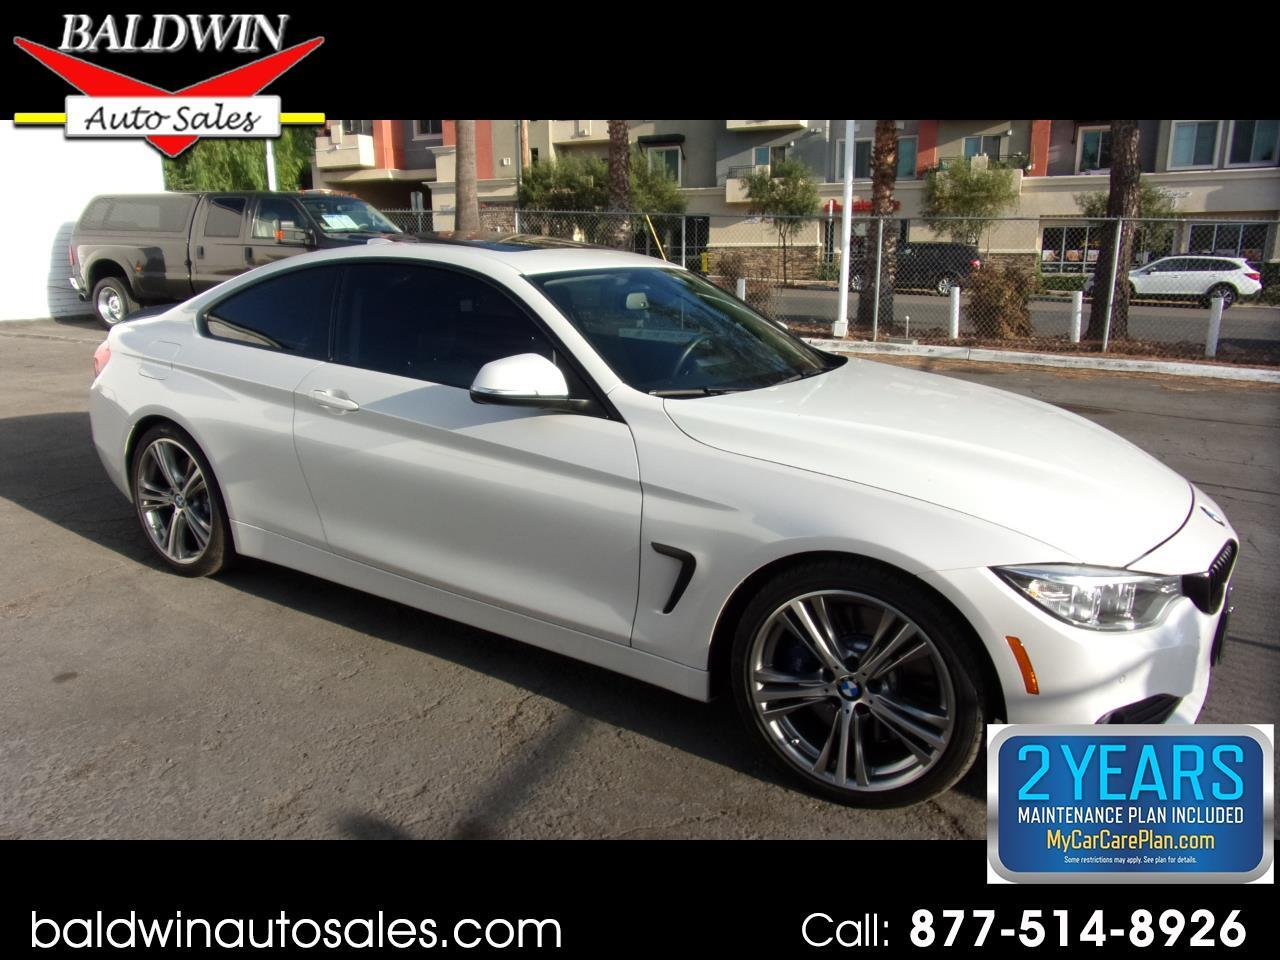 BMW 4 Series 2dr Cpe 435i RWD 2015